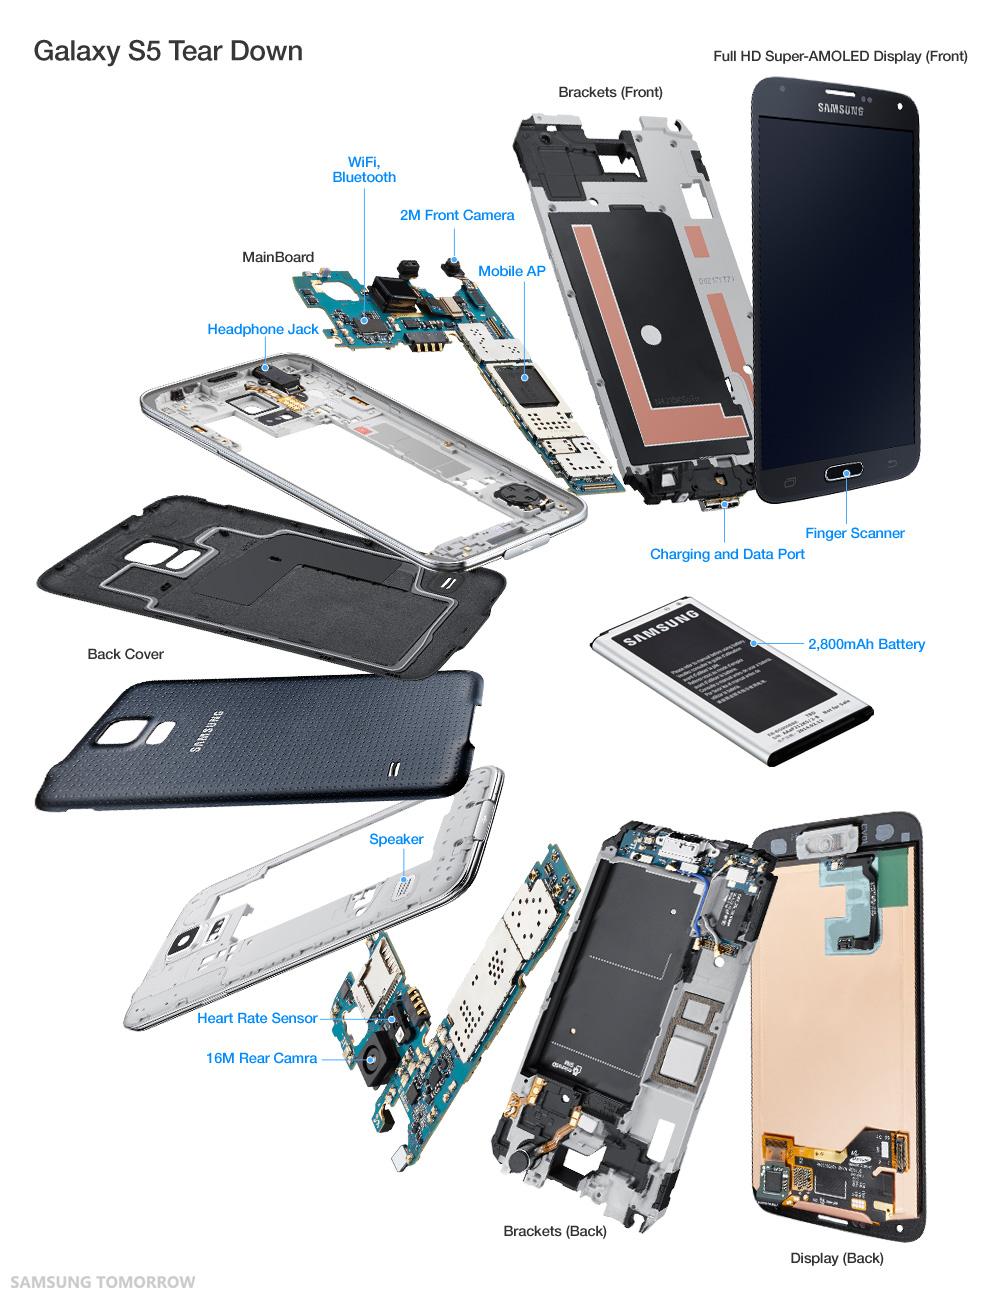 back of iphone 4s diagram toyota starlet wiring internal parts nemetas aufgegabelt info galaxy s5 tear down do you see what we samsung breakdown verizon